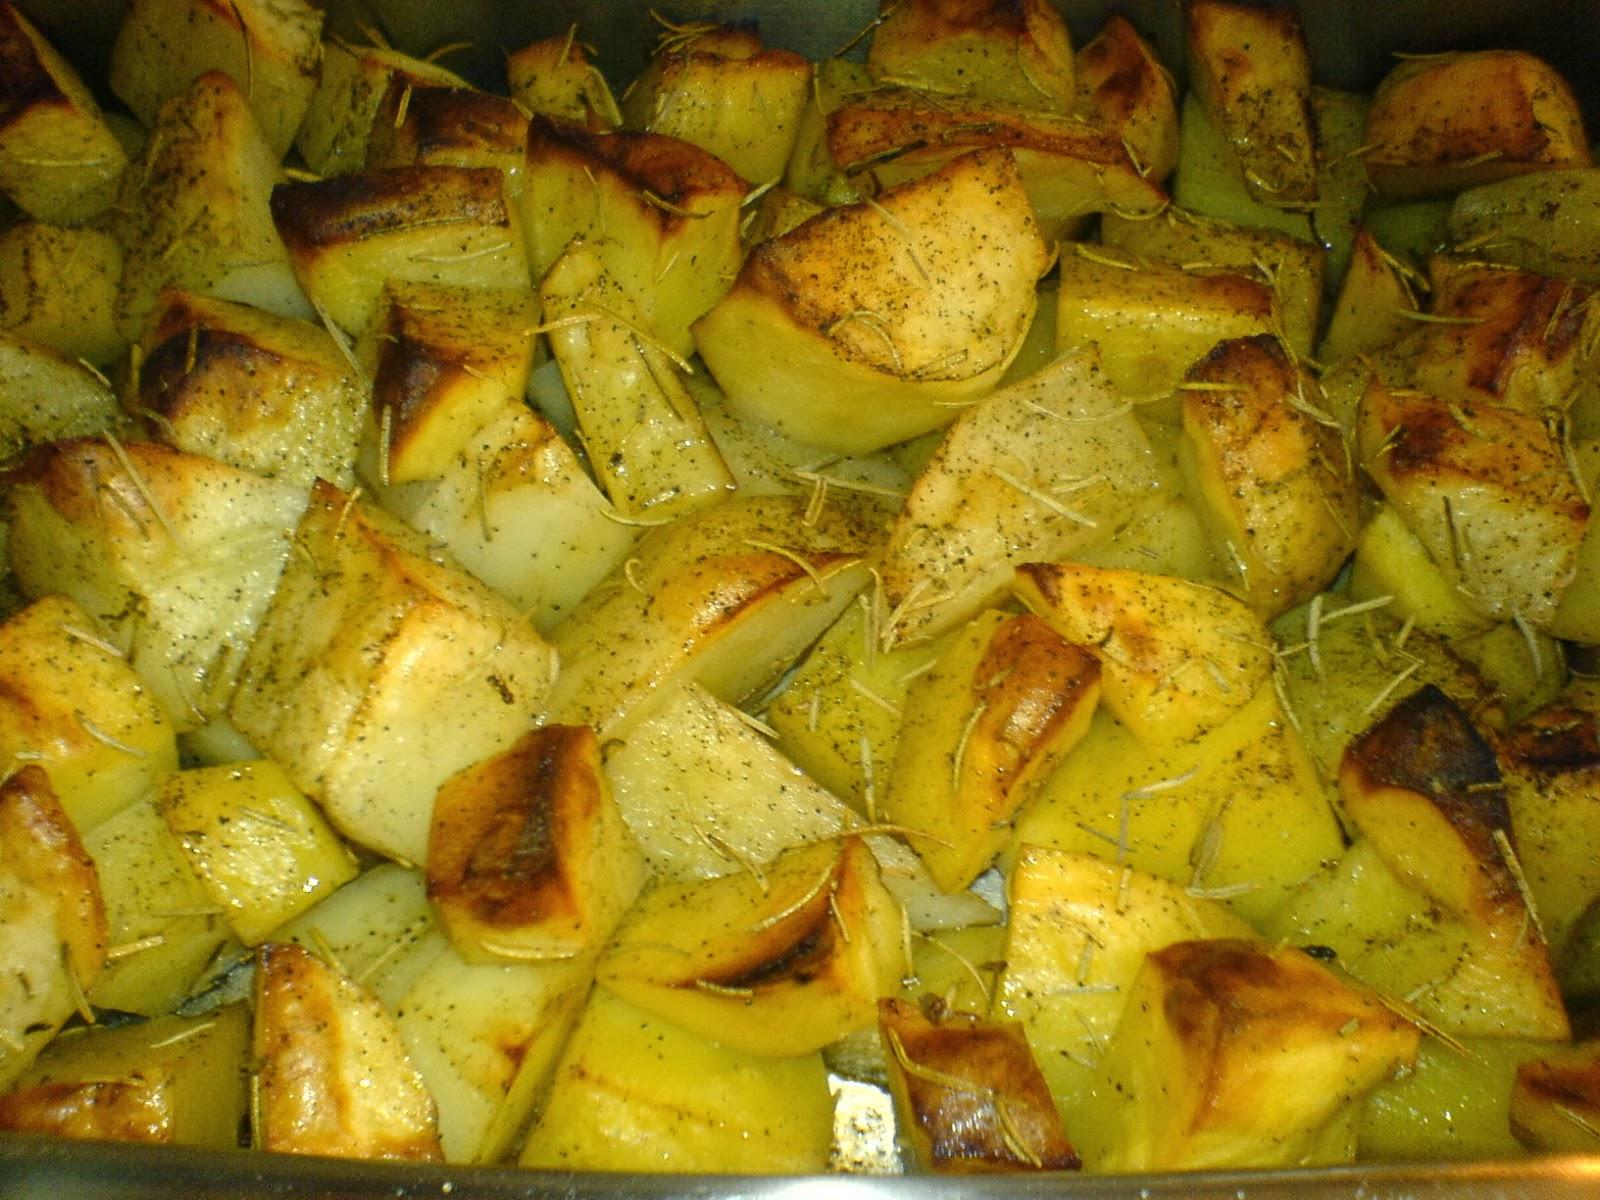 cartofi copti, cartofi la cuptor, mancare de cartofi, retete culinare, retete de mancare, cure si diete, mancare sanatoasa, retete cu cartofi, preparate din cartofi, cartofi cu rozmarin, delicii culinare, retete de post,